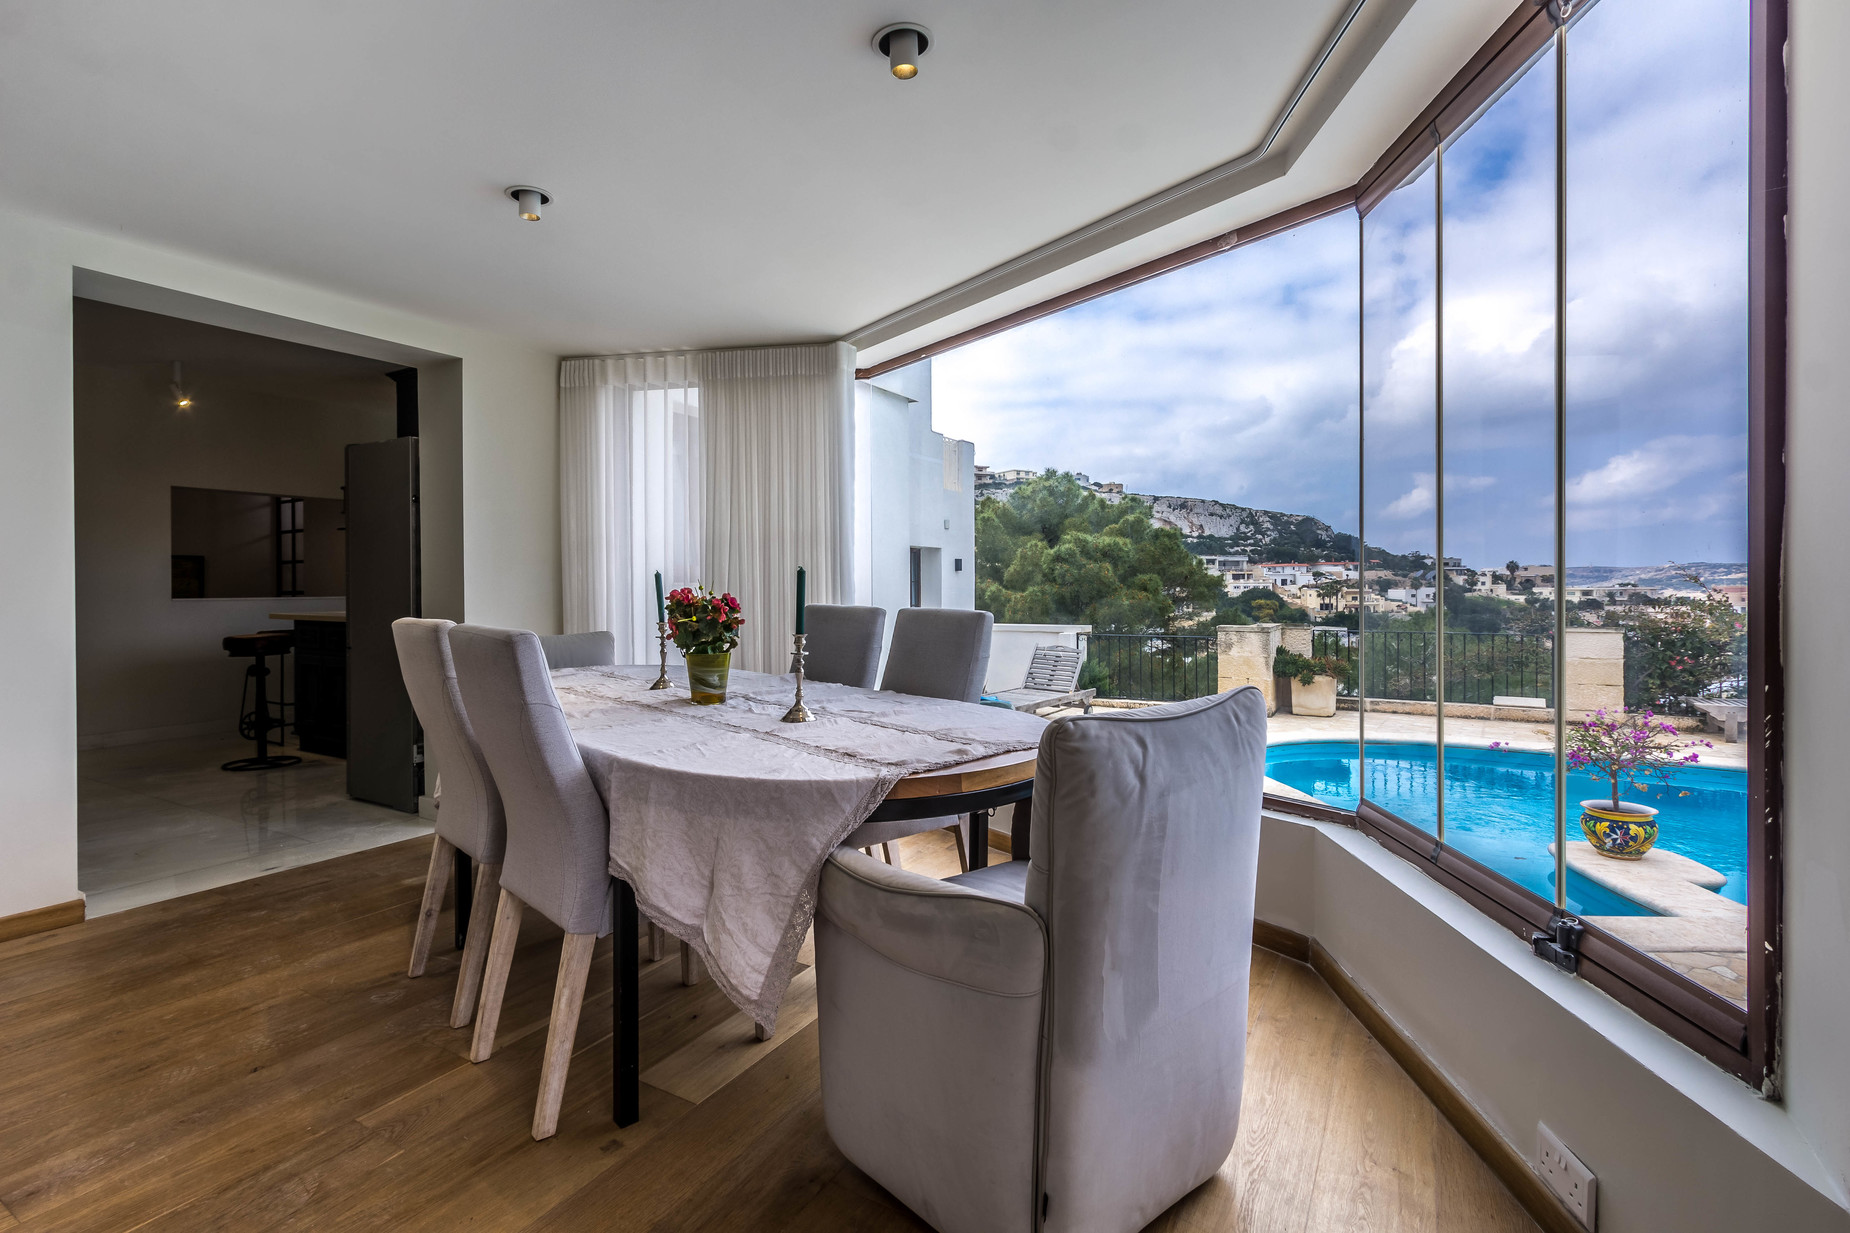 4 bed Villa For Rent in Mellieha, Mellieha - thumb 11